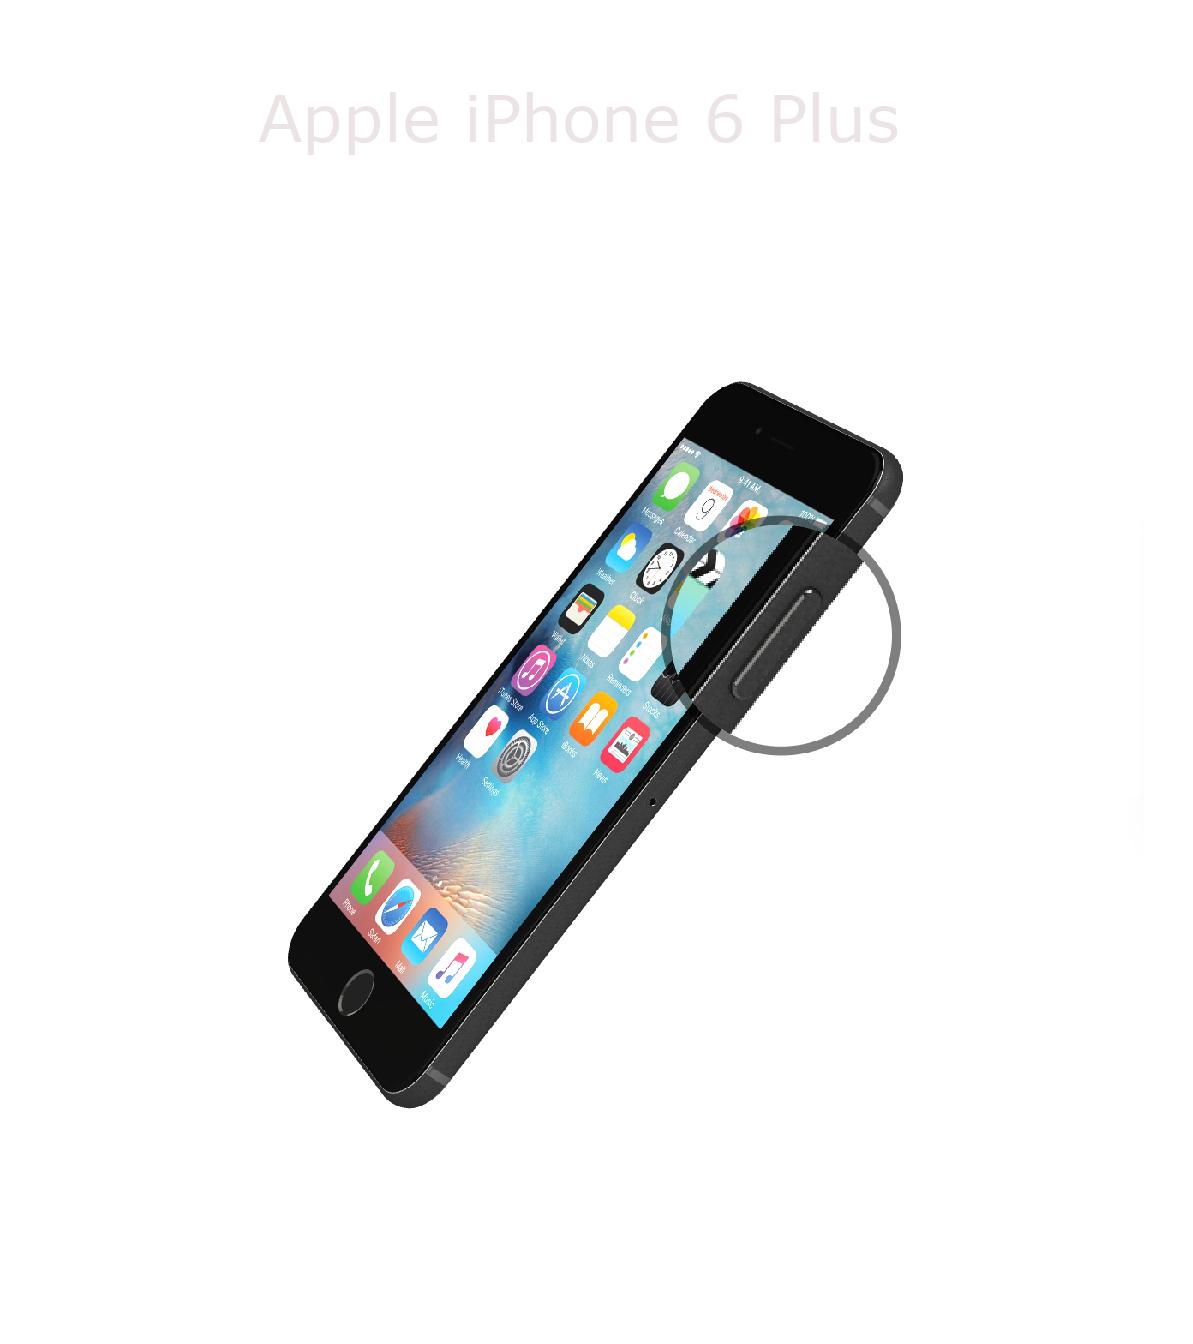 Laga powerknapp iPhone 6 plus